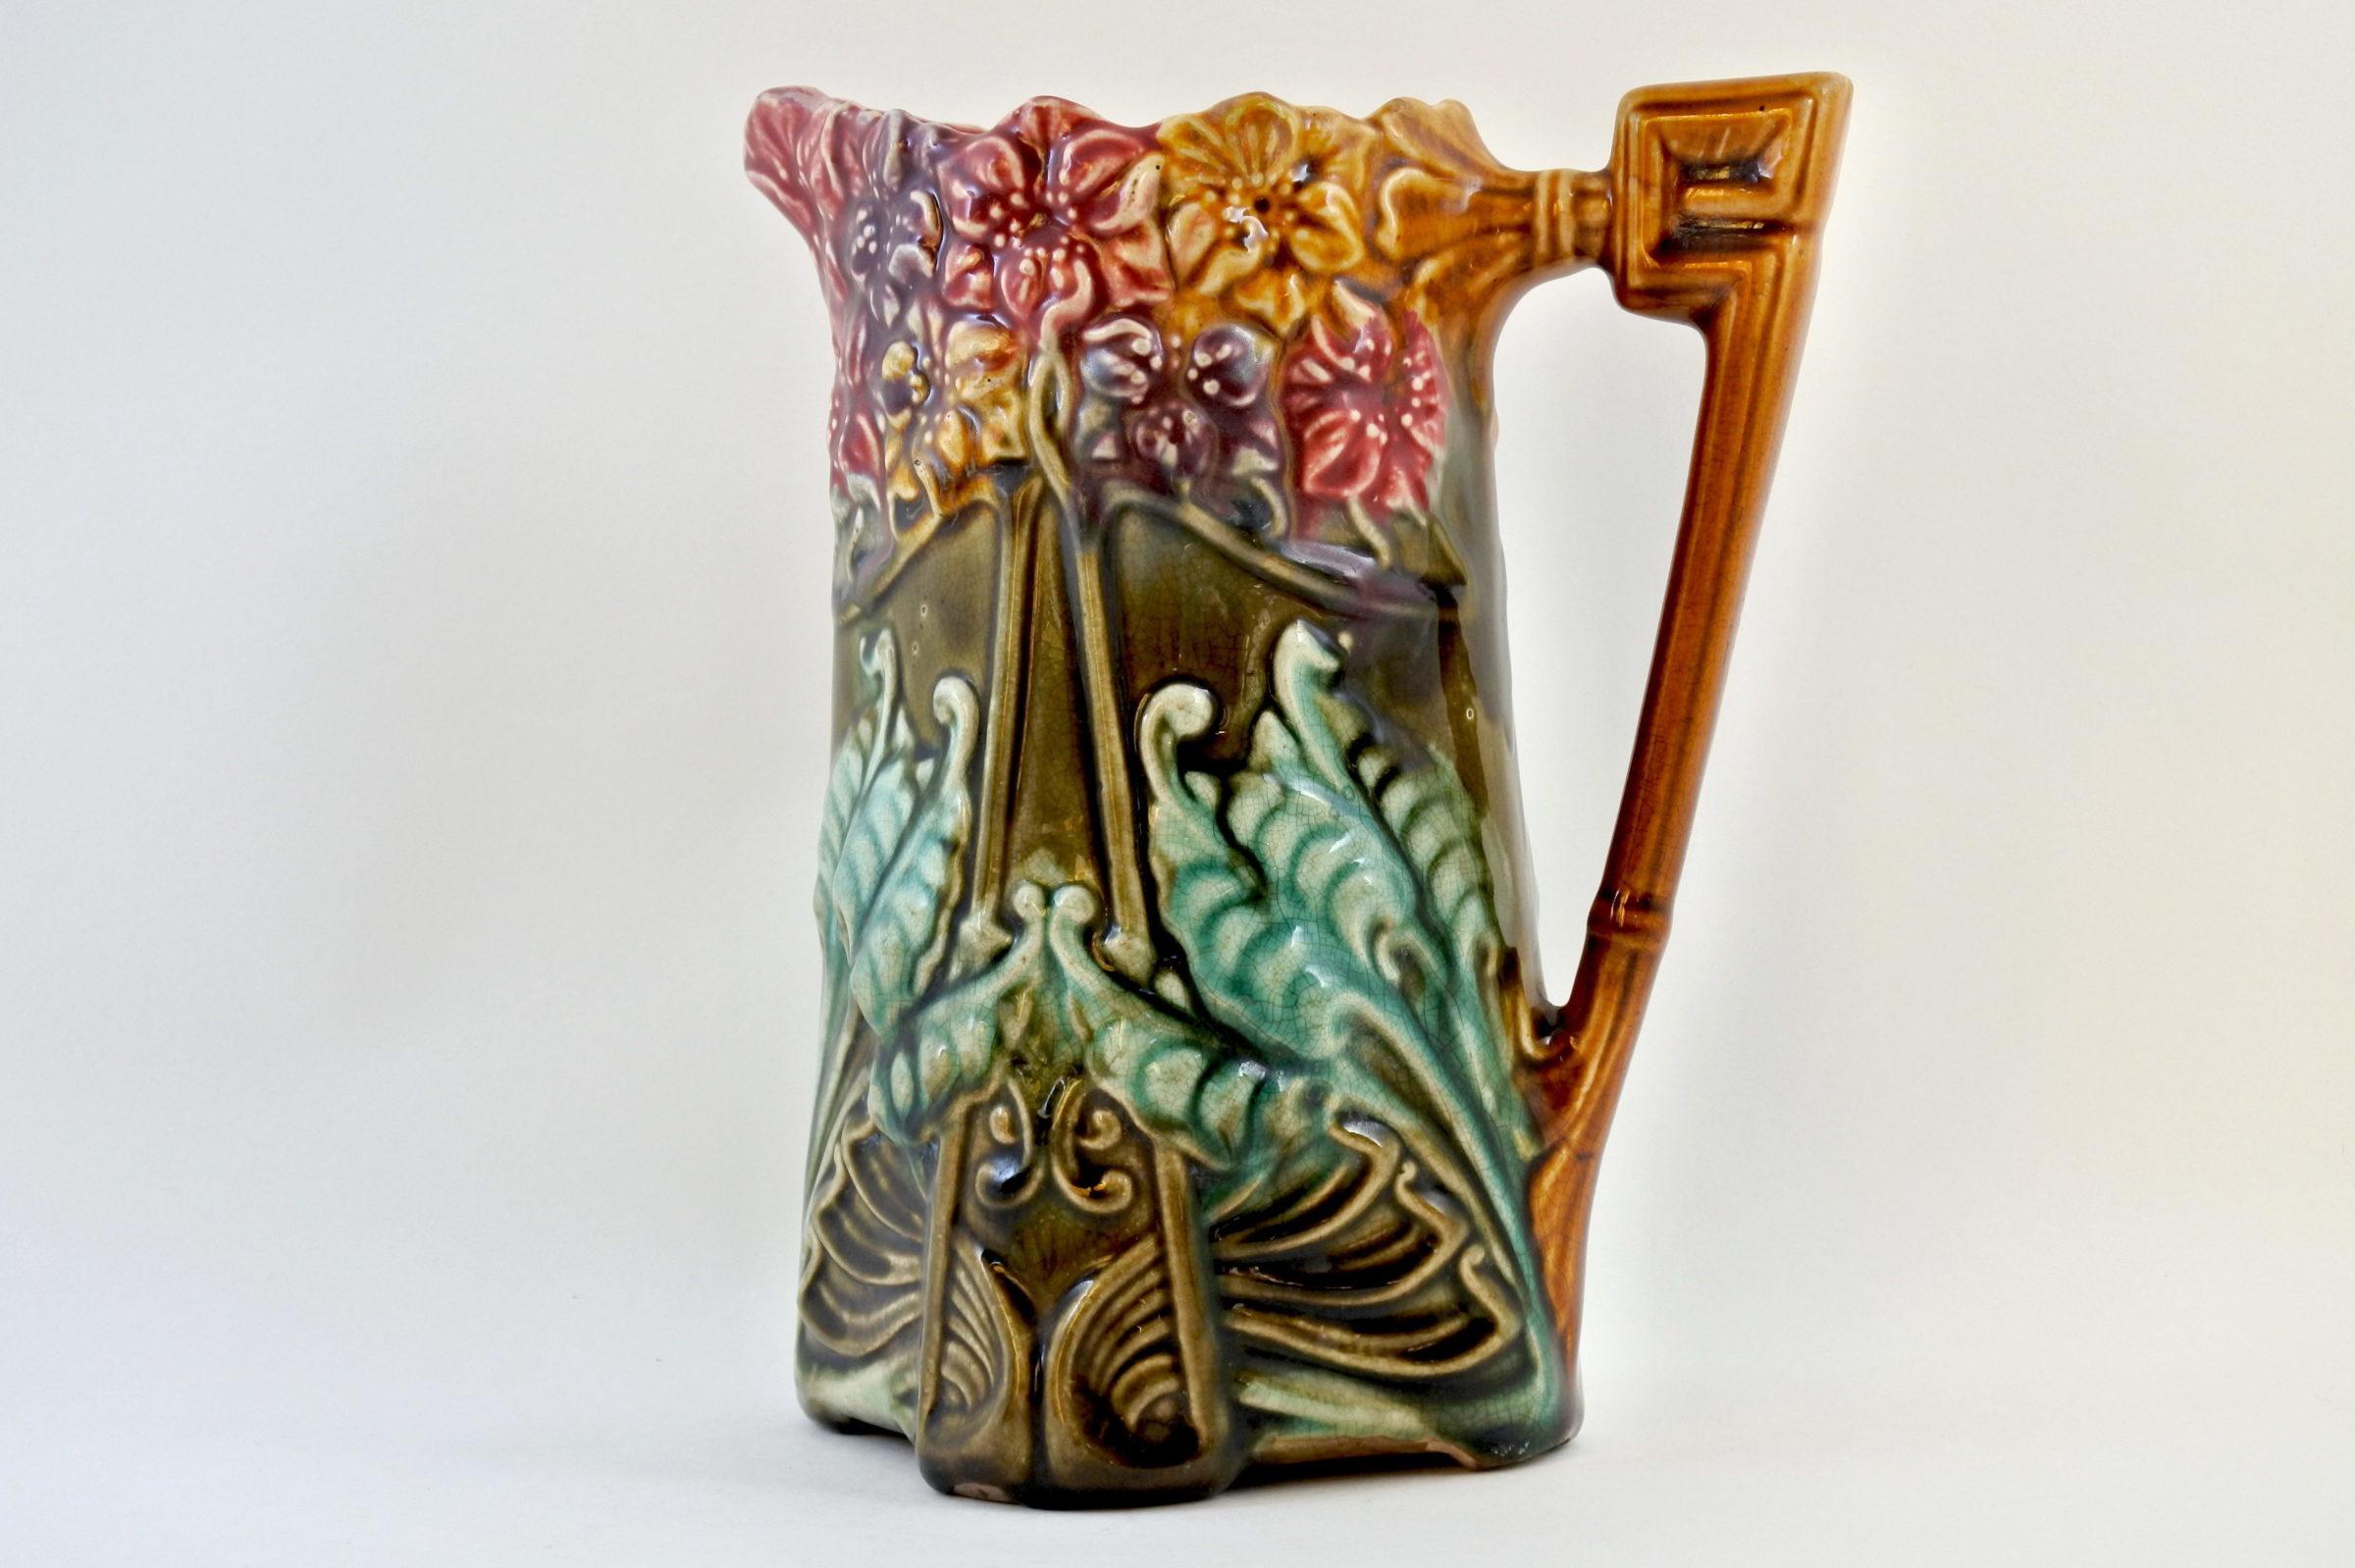 Brocca in ceramica barbotine con giacinti - Jacinthes - 2